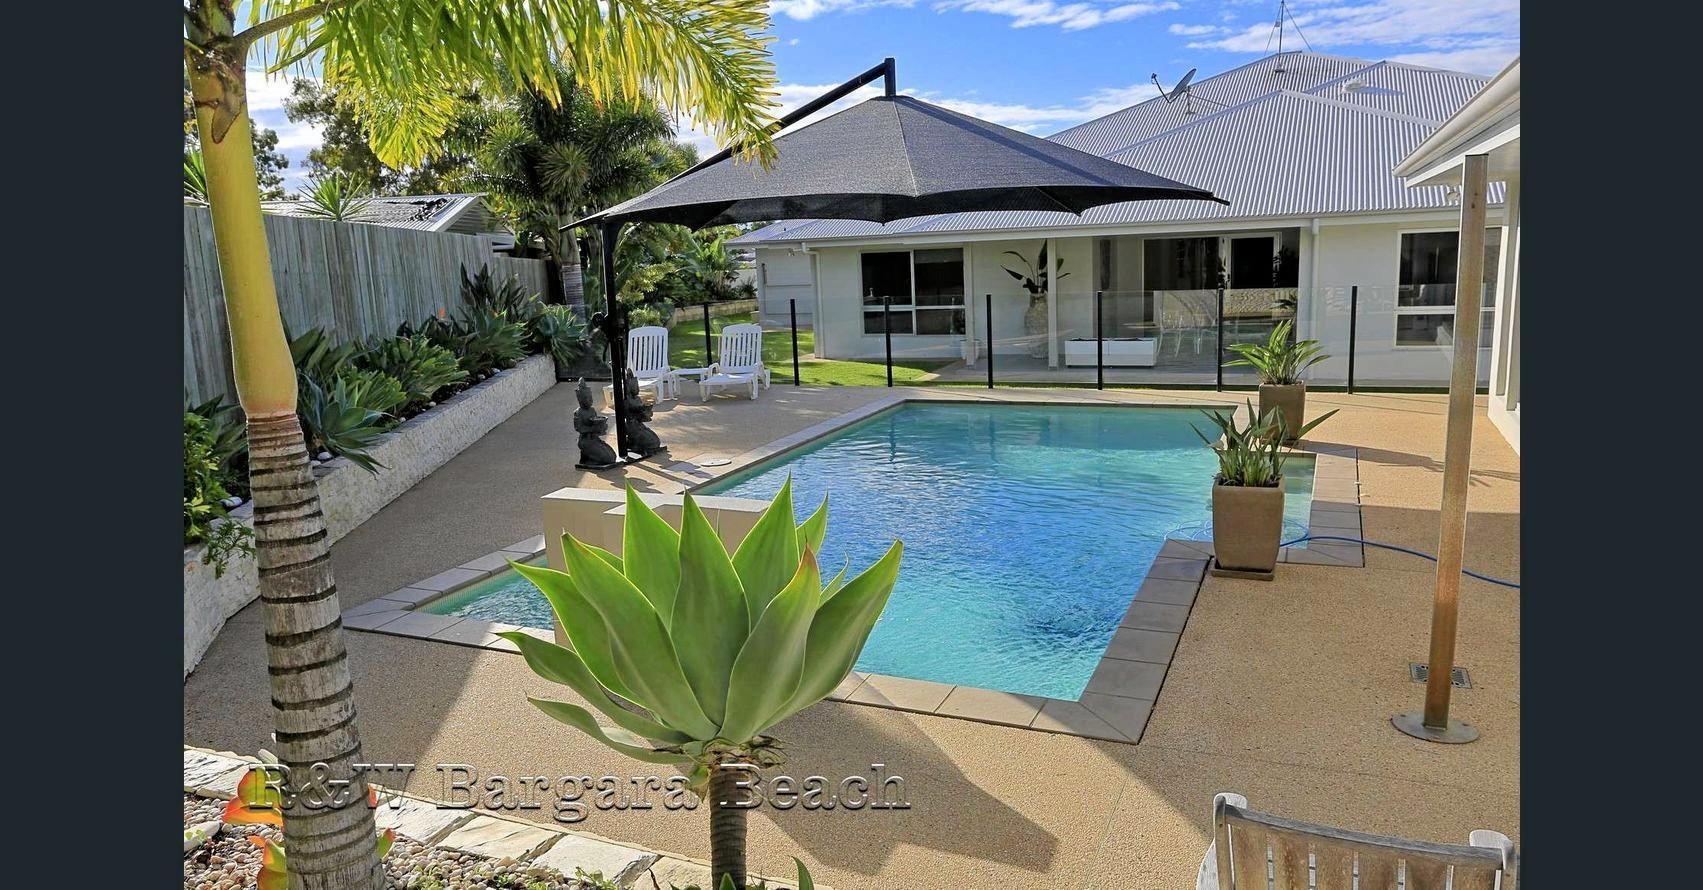 The house, pool house